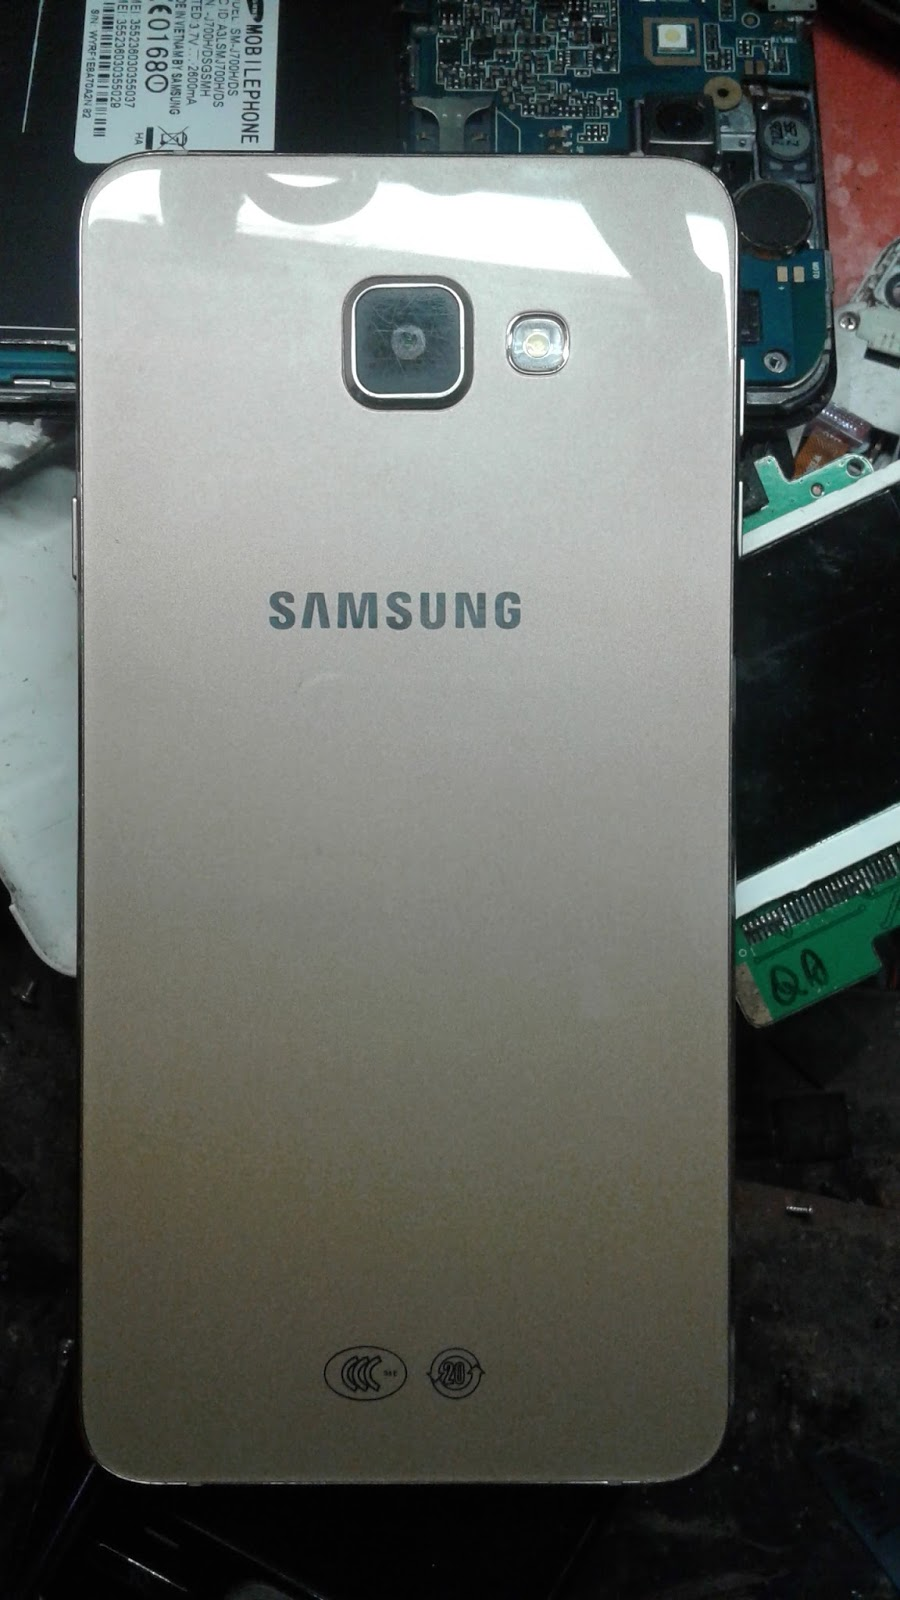 Samsung A7 (2016)-Galaxy A76 Sm-A7100 Clone copy MT6580 V5.1 flash file 100% tested – hard-reset